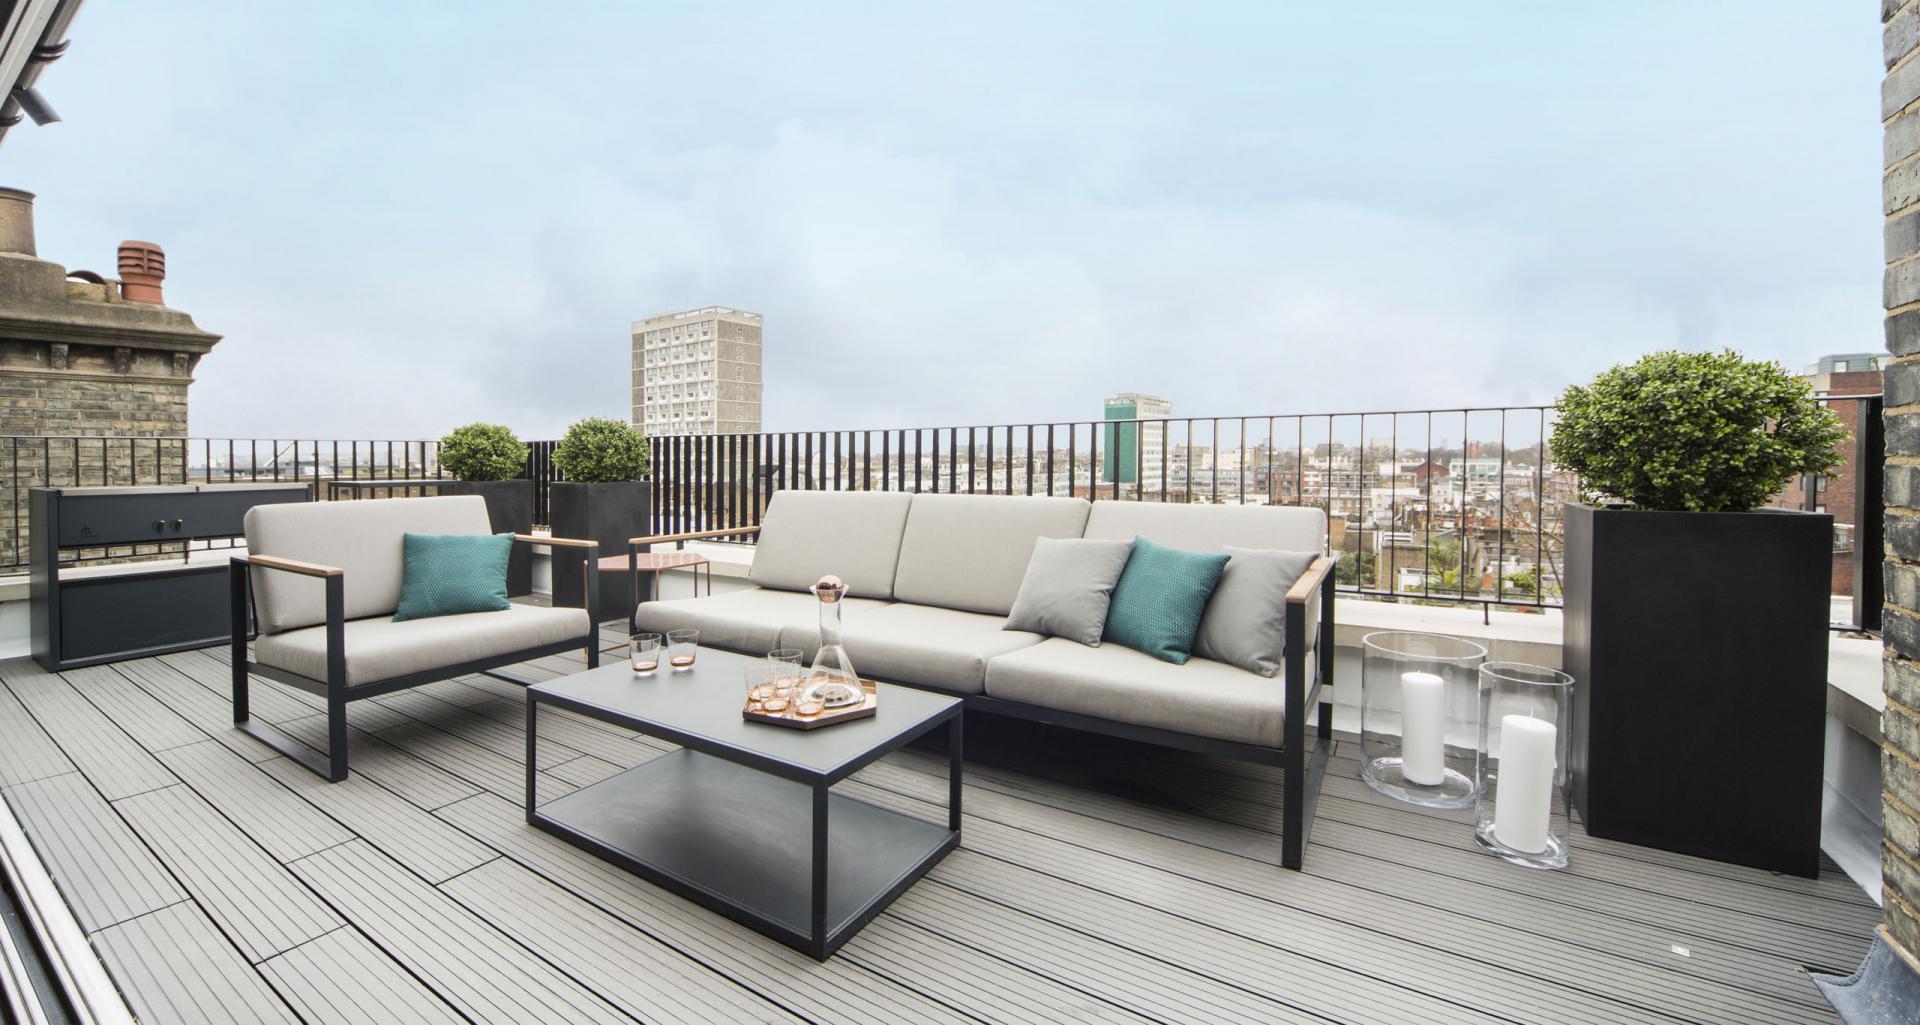 Terrace at 21 Campden Hill Garden House, Notting Hill, London - Citybase Apartments